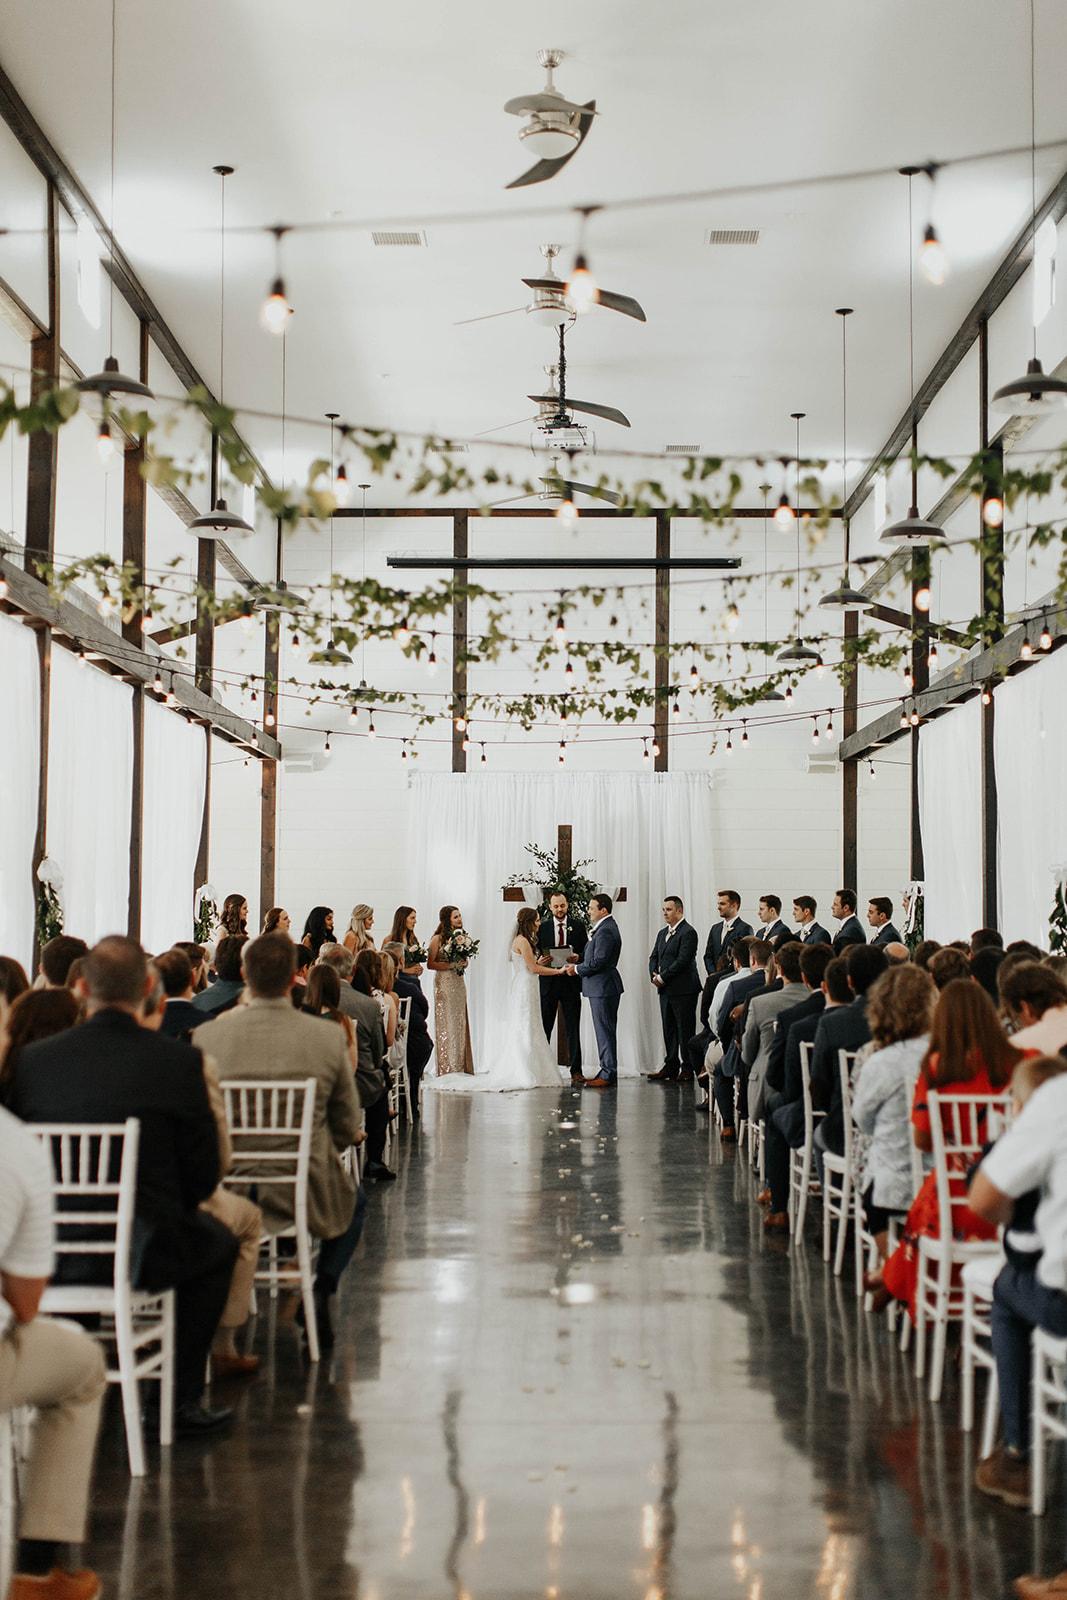 Tulsa Bixby Oklahoma Best Wedding and Reception Venue 16.jpg